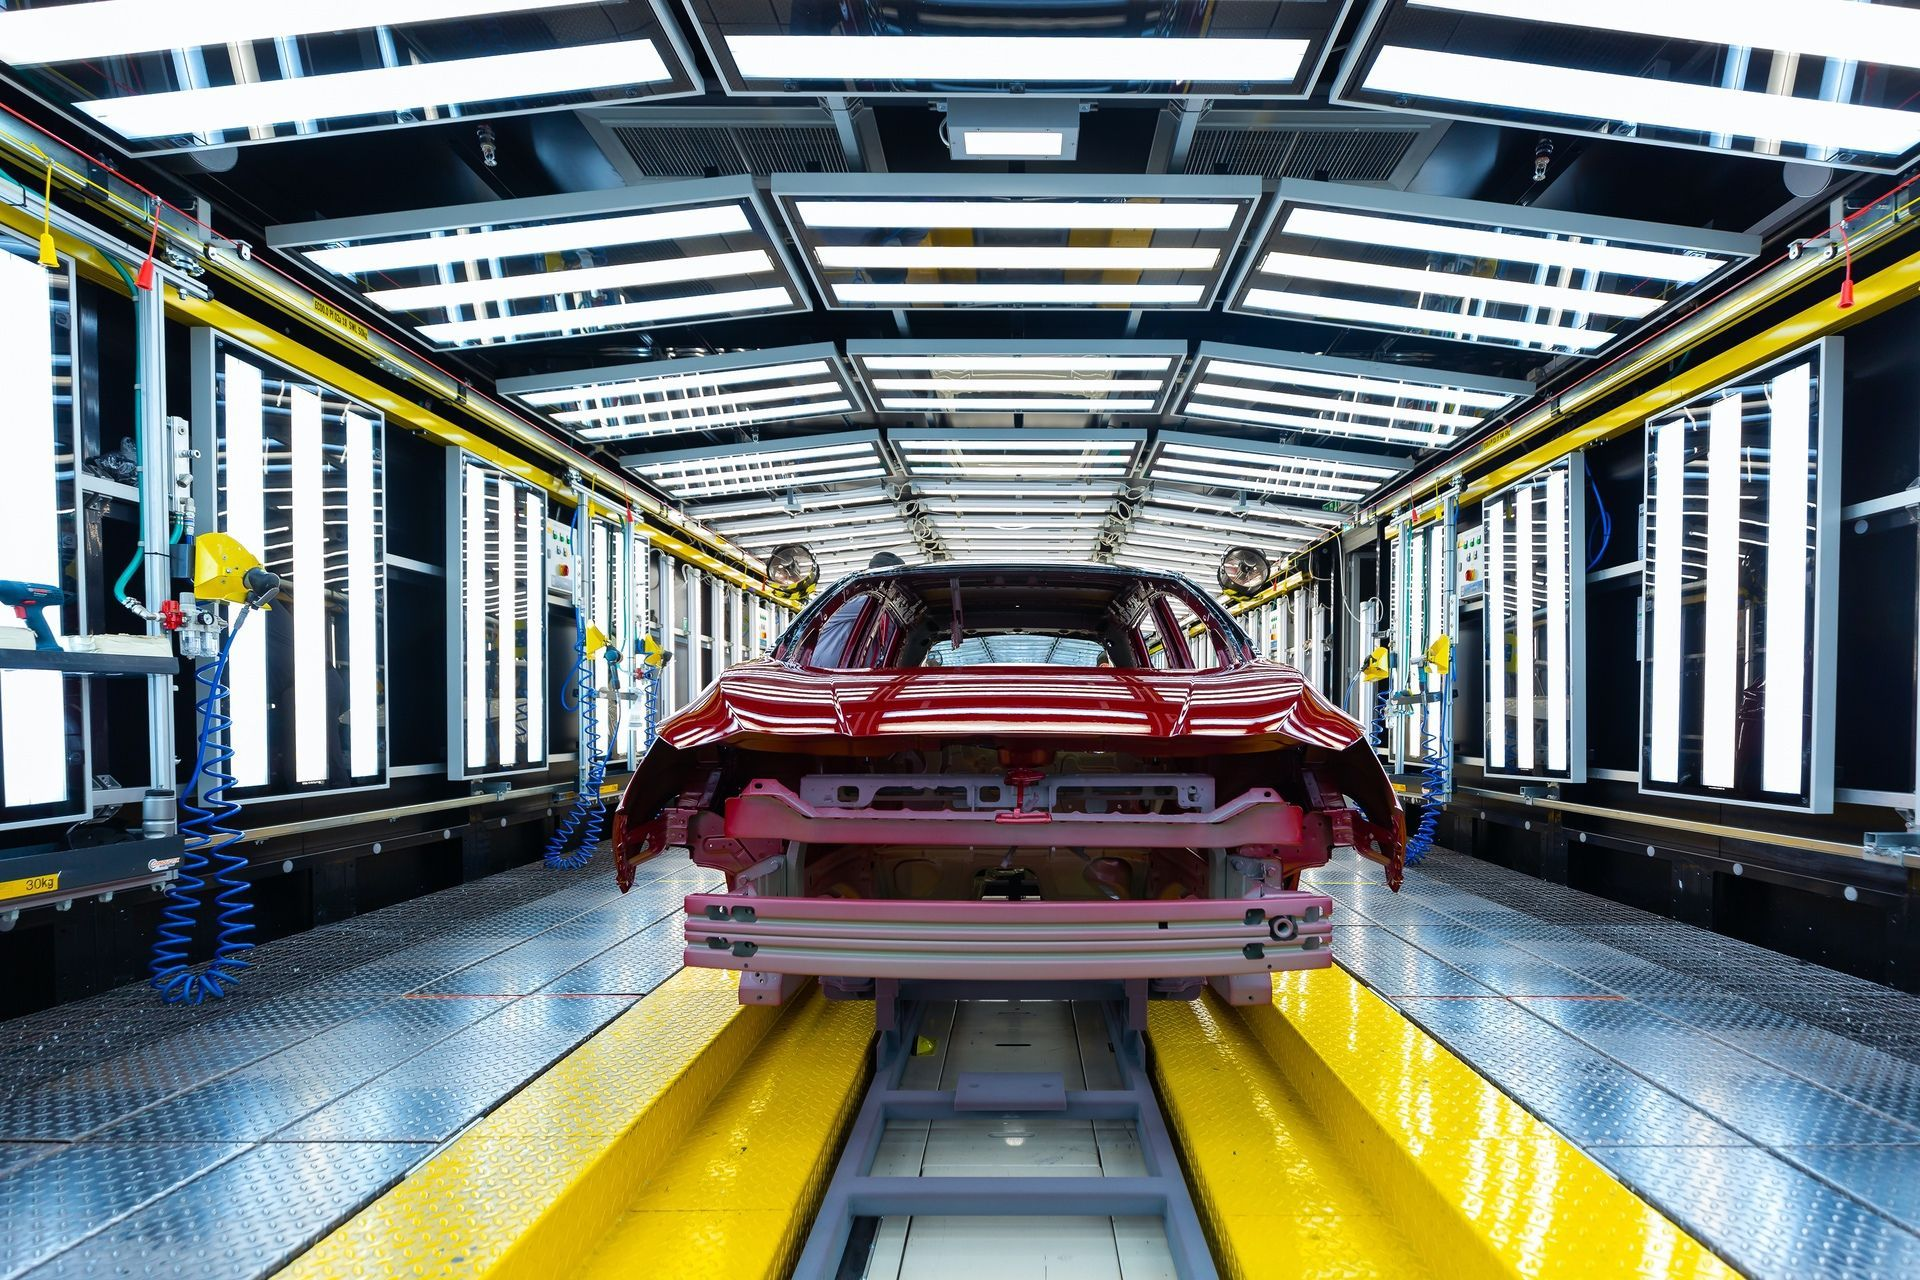 Nissansworld-classmanufacturingensureseachNissanLEAFembodiesthereassuringqualityhonedover10yearsofproduction